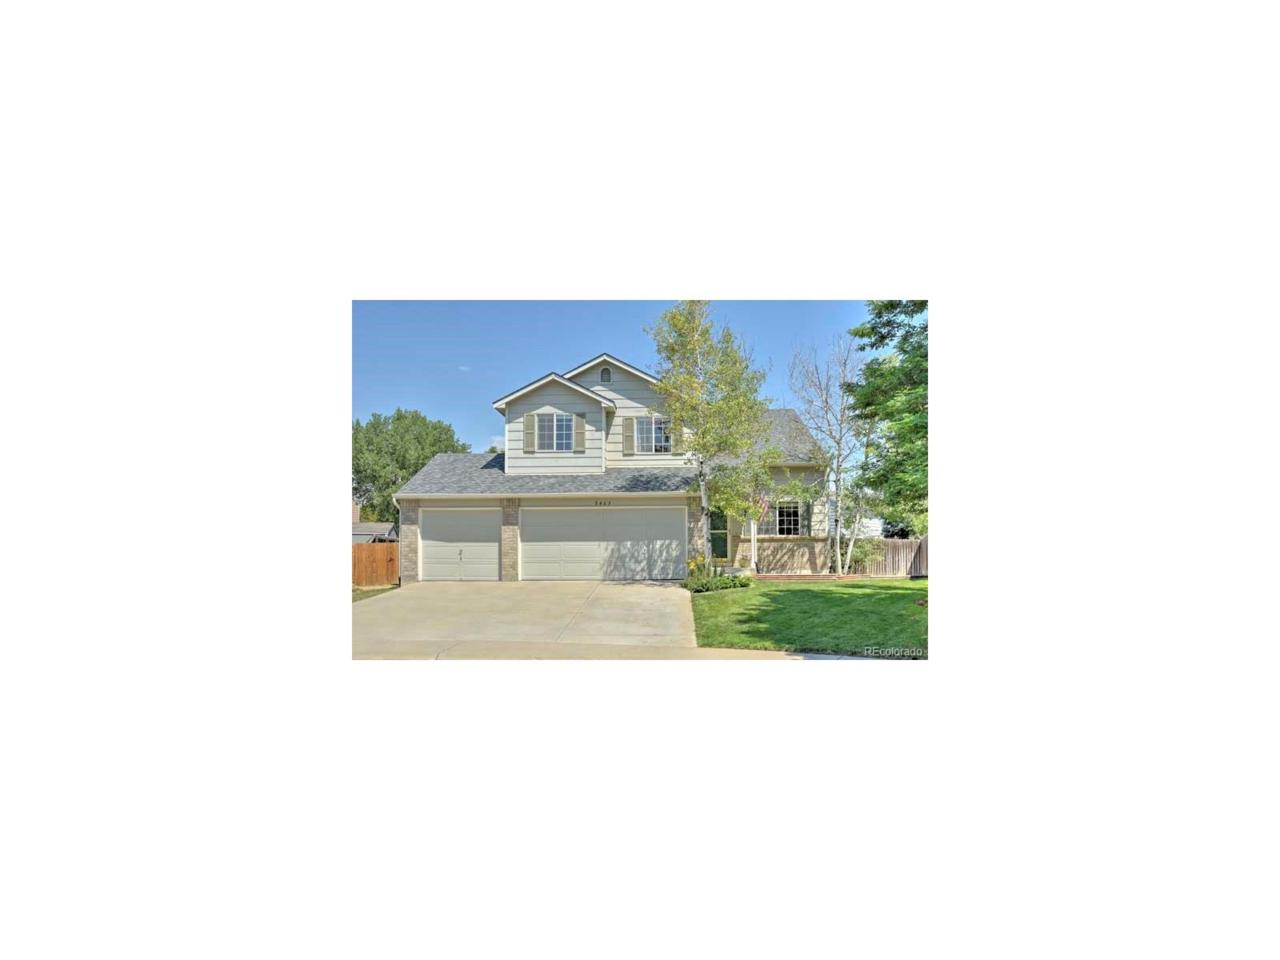 5463 E 128th Court, Thornton, CO 80241 (MLS #6882833) :: 8z Real Estate